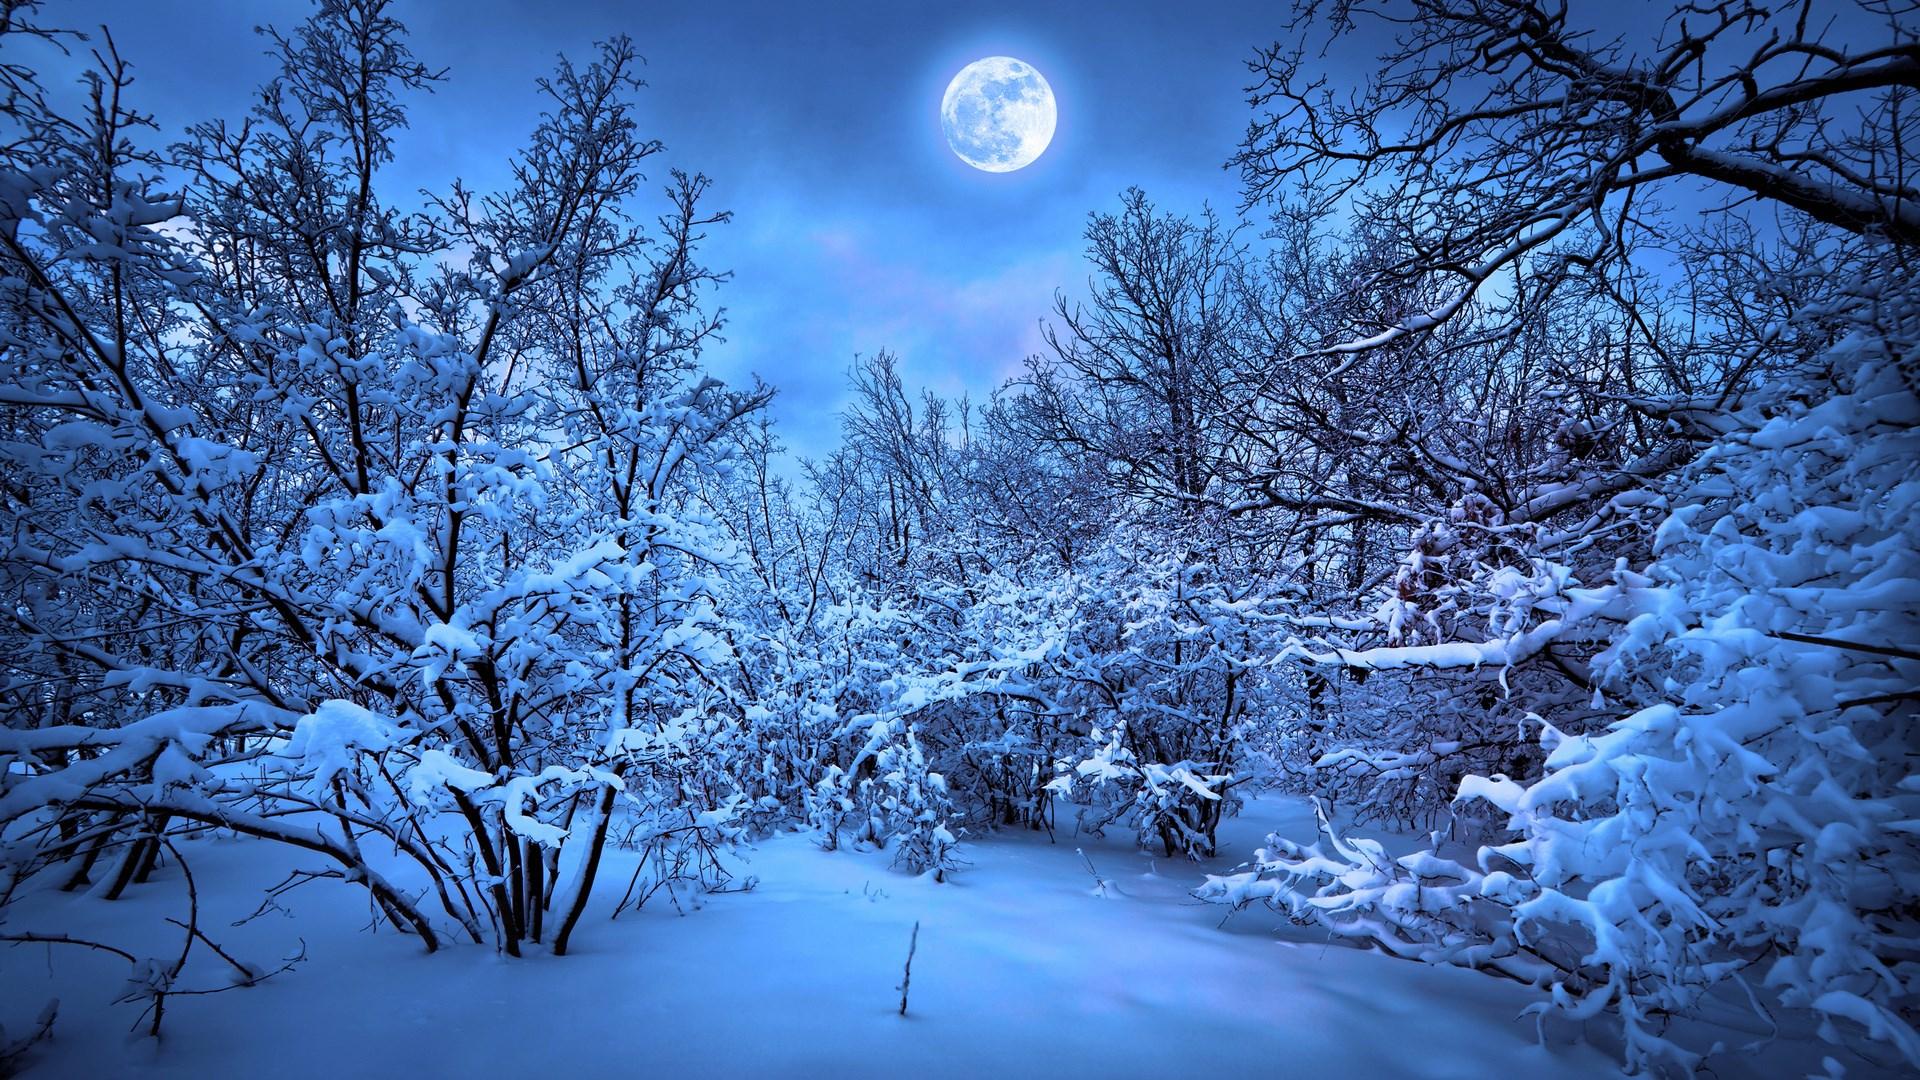 snowy-background-hd-kB-Melbourne-Longman-wallpaper-wpc9009272